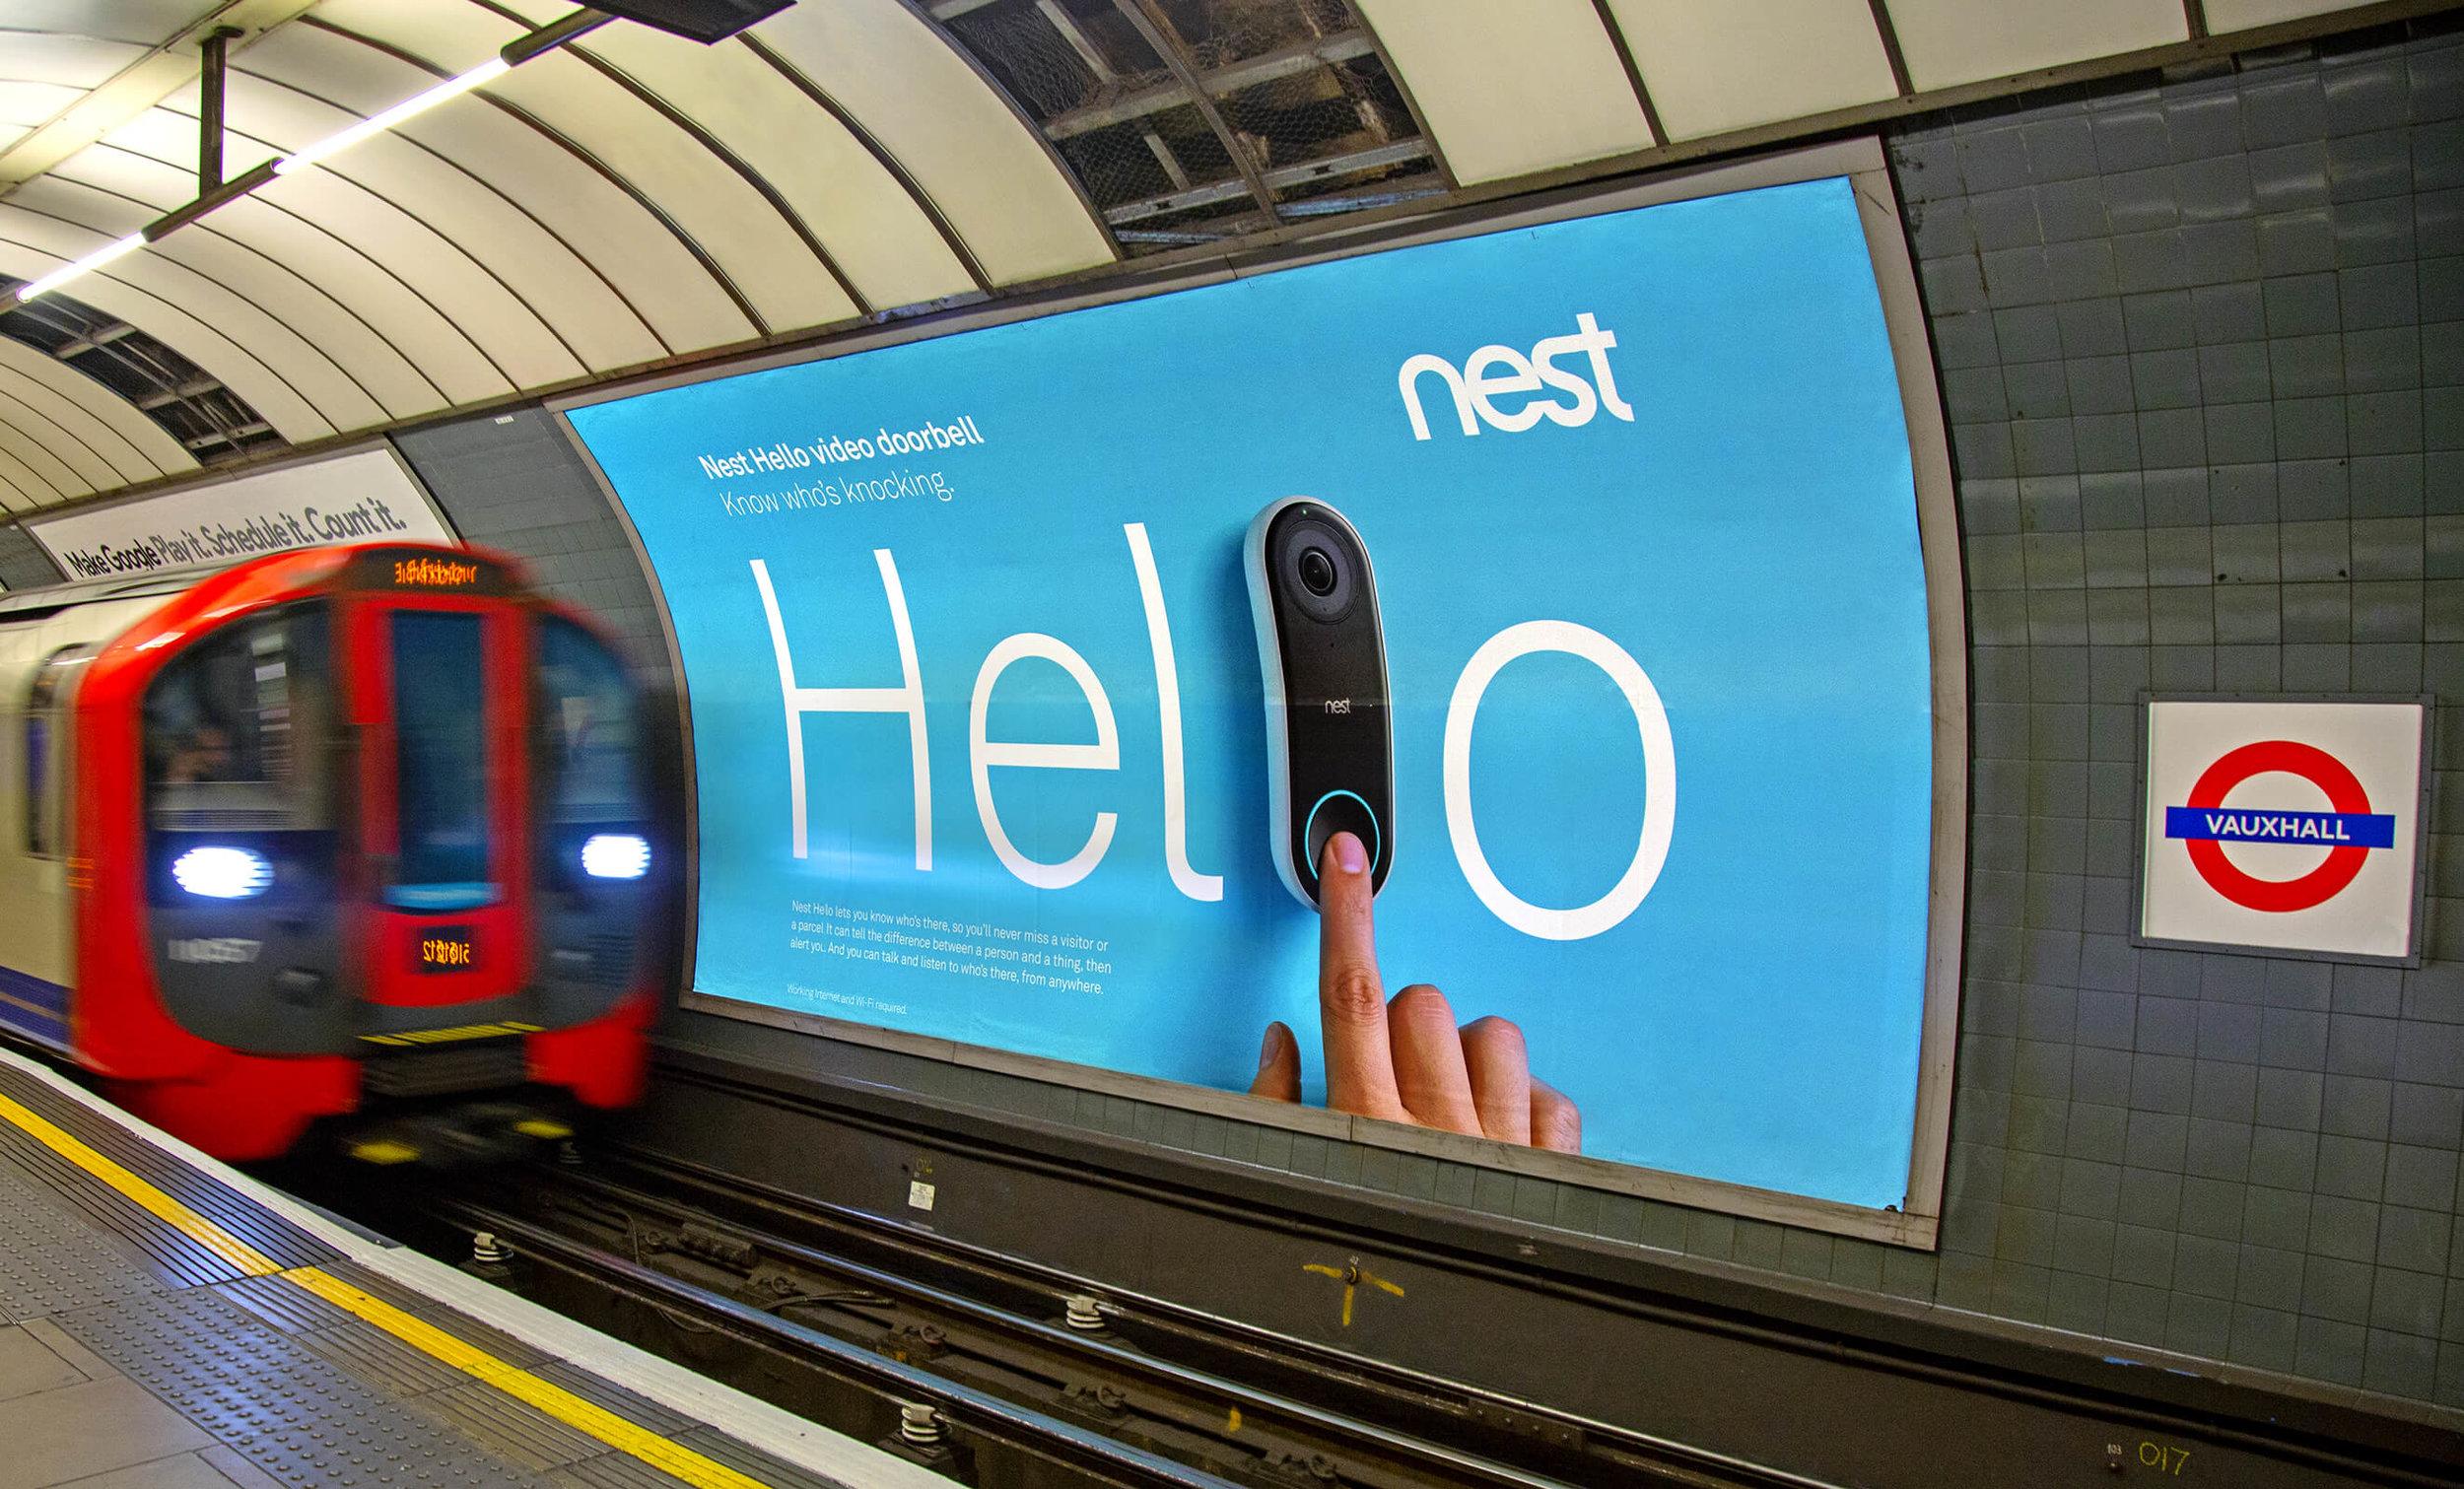 nest_hello_uk_1.jpg